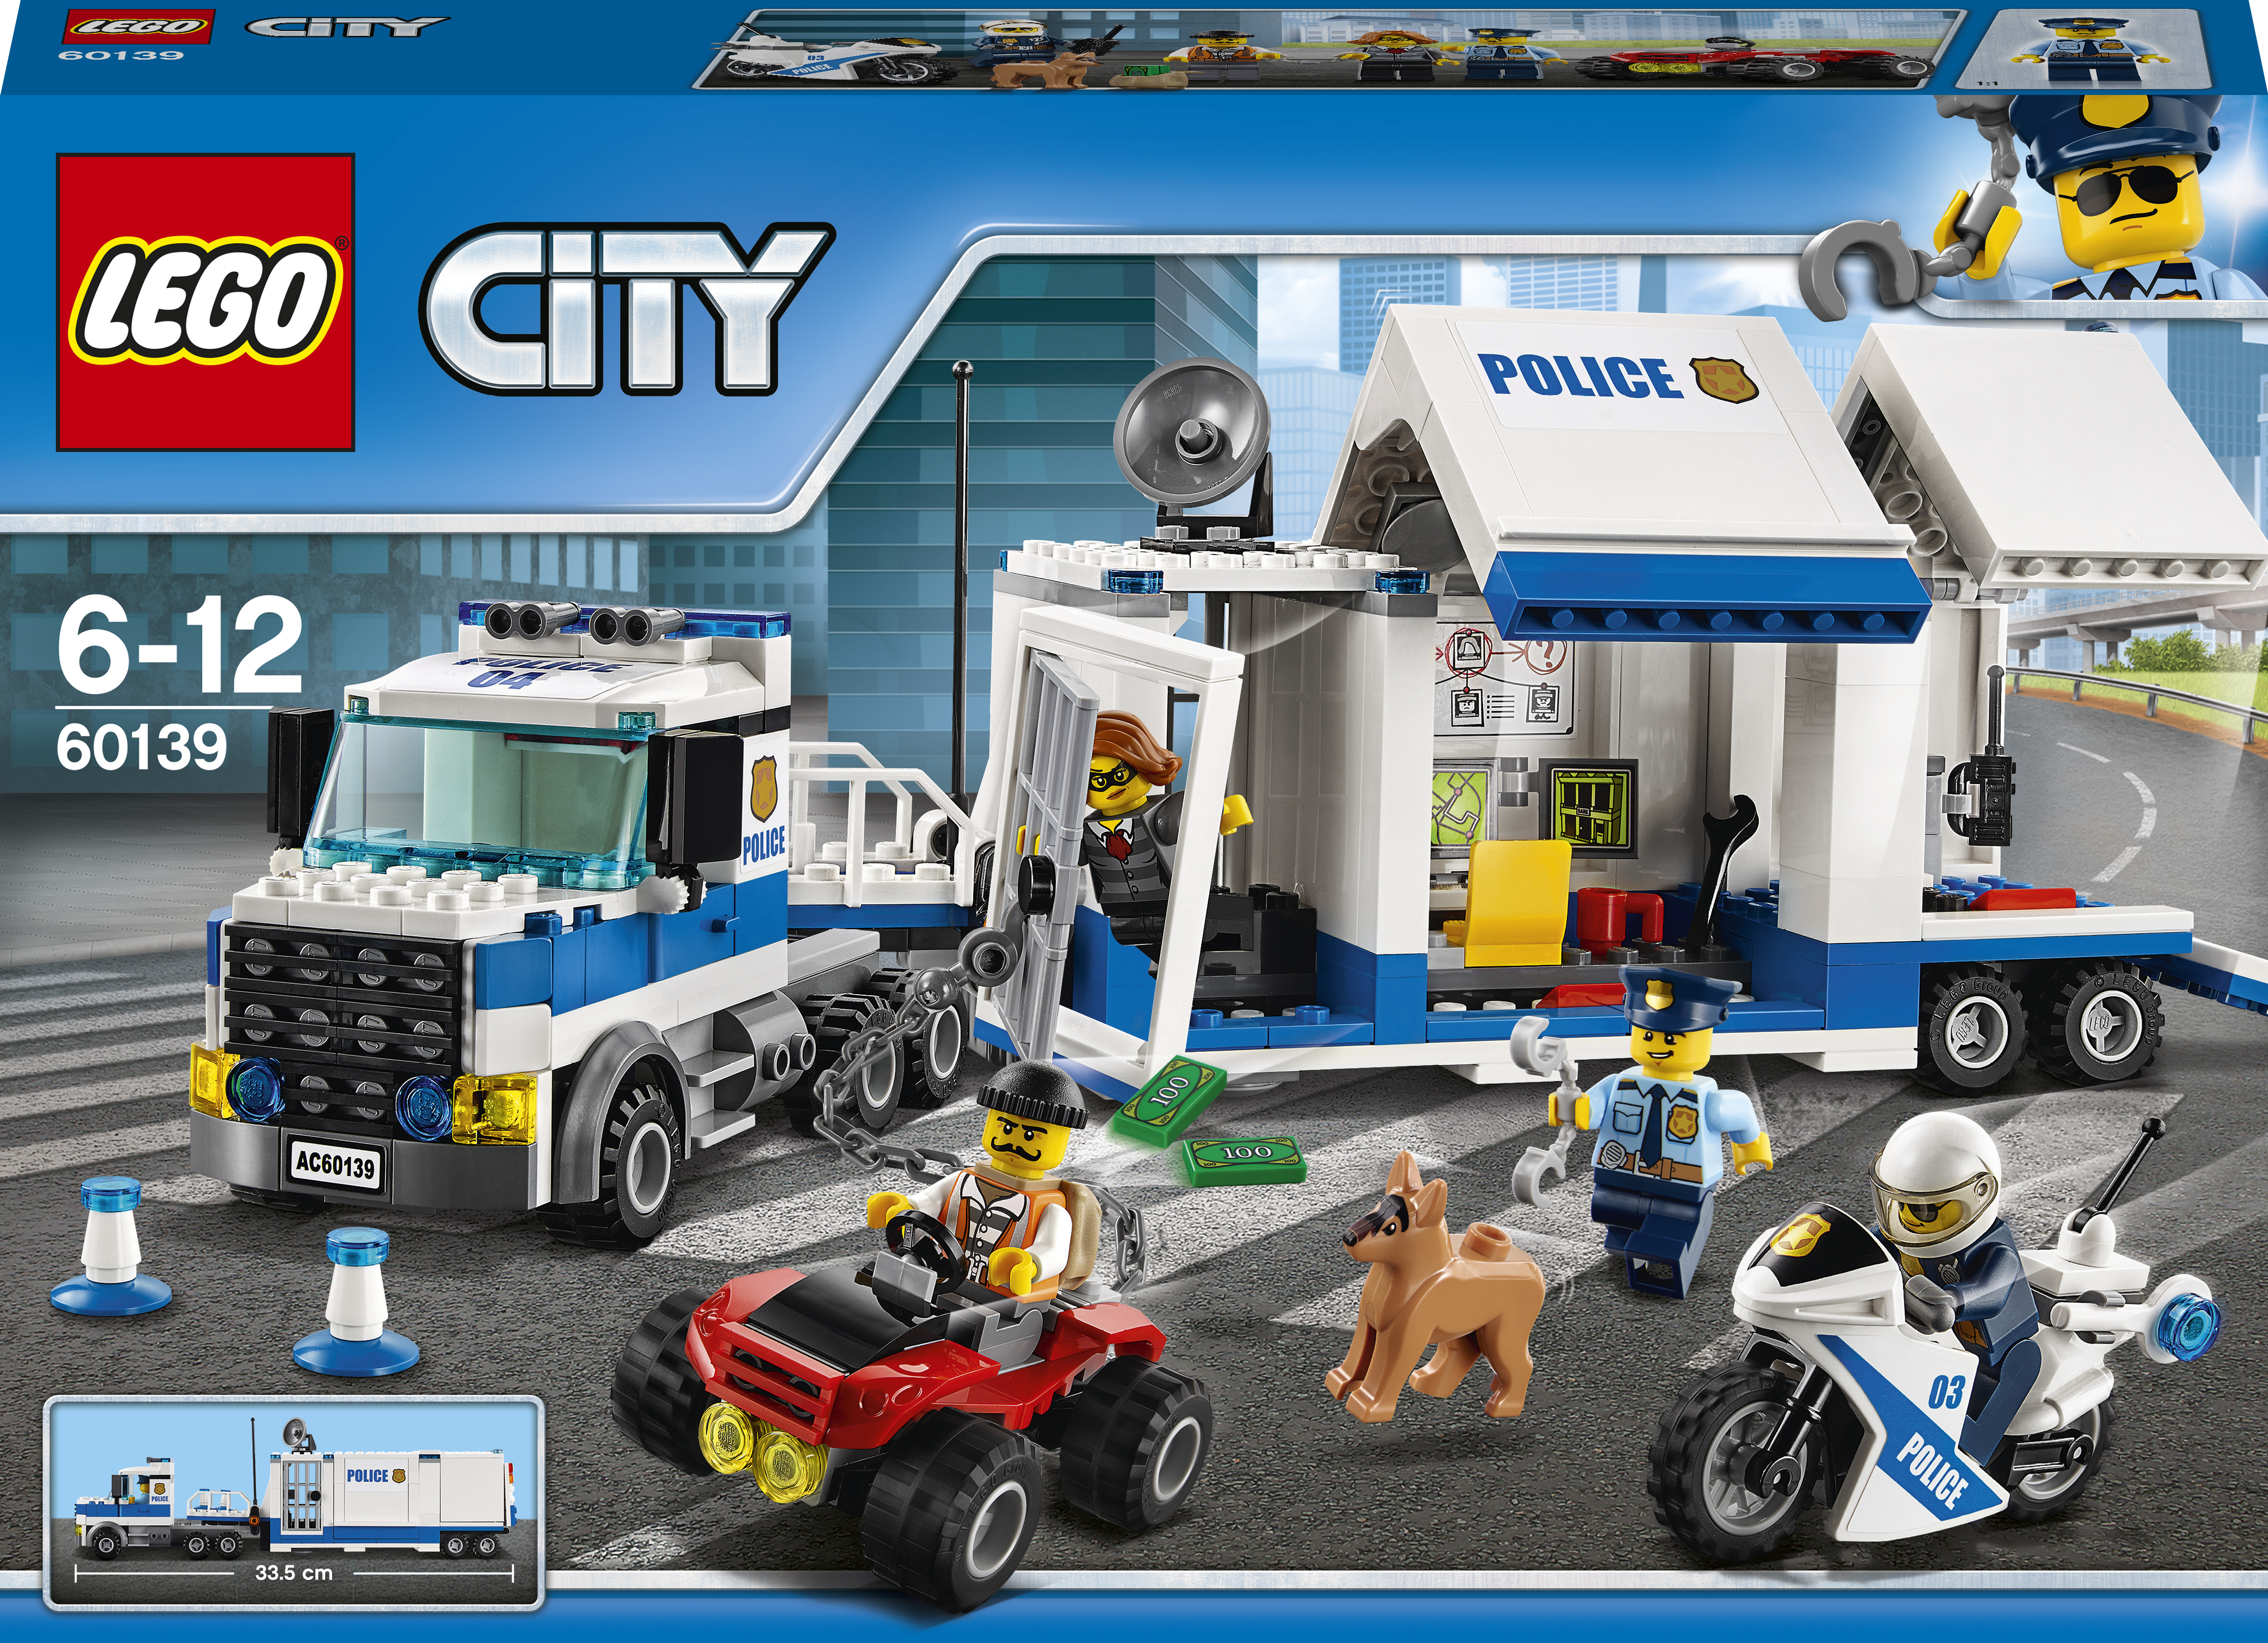 LEGO City Police Centru de comanda mobil - L60139